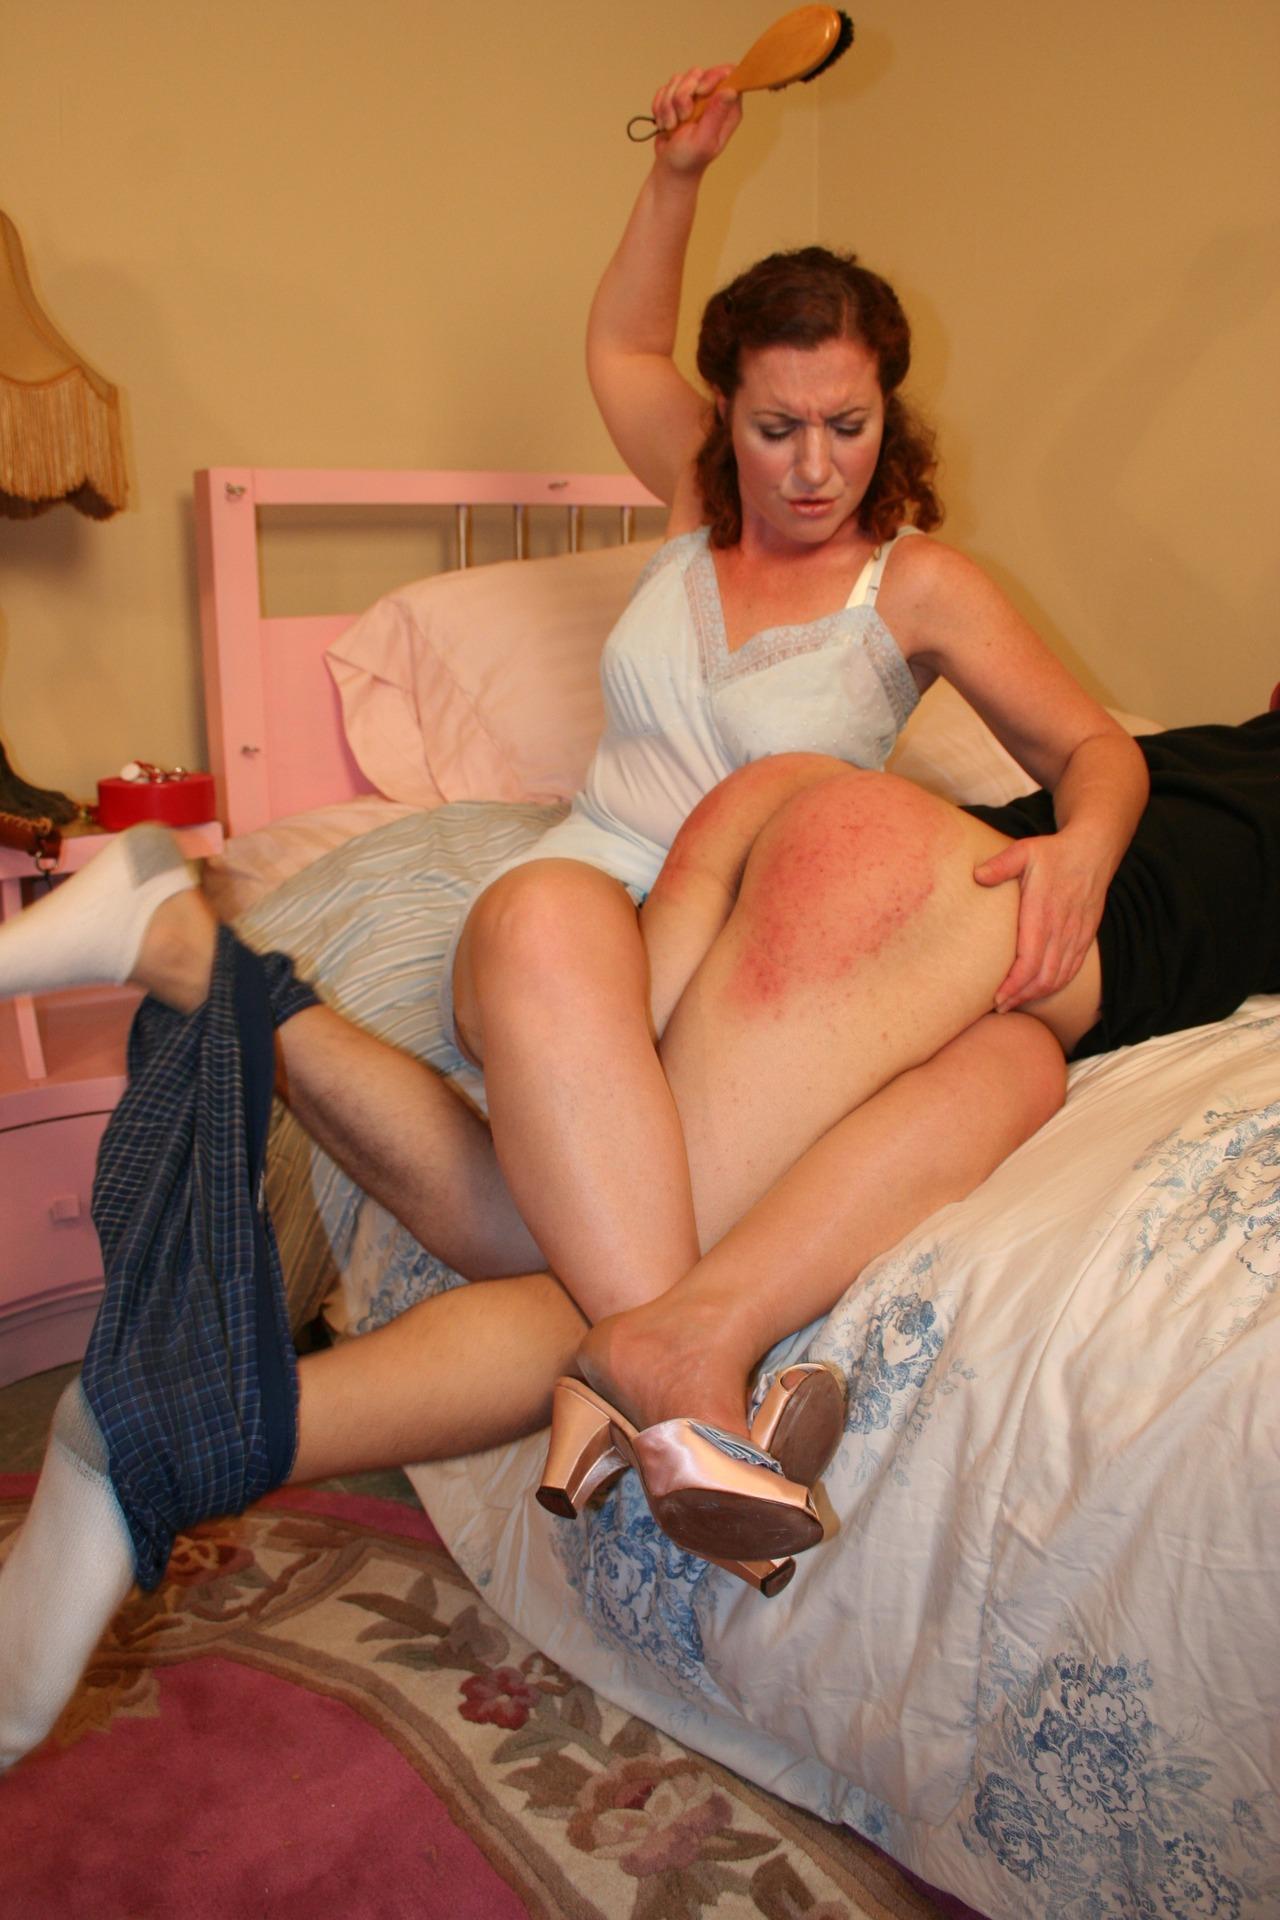 Girls spanking videos